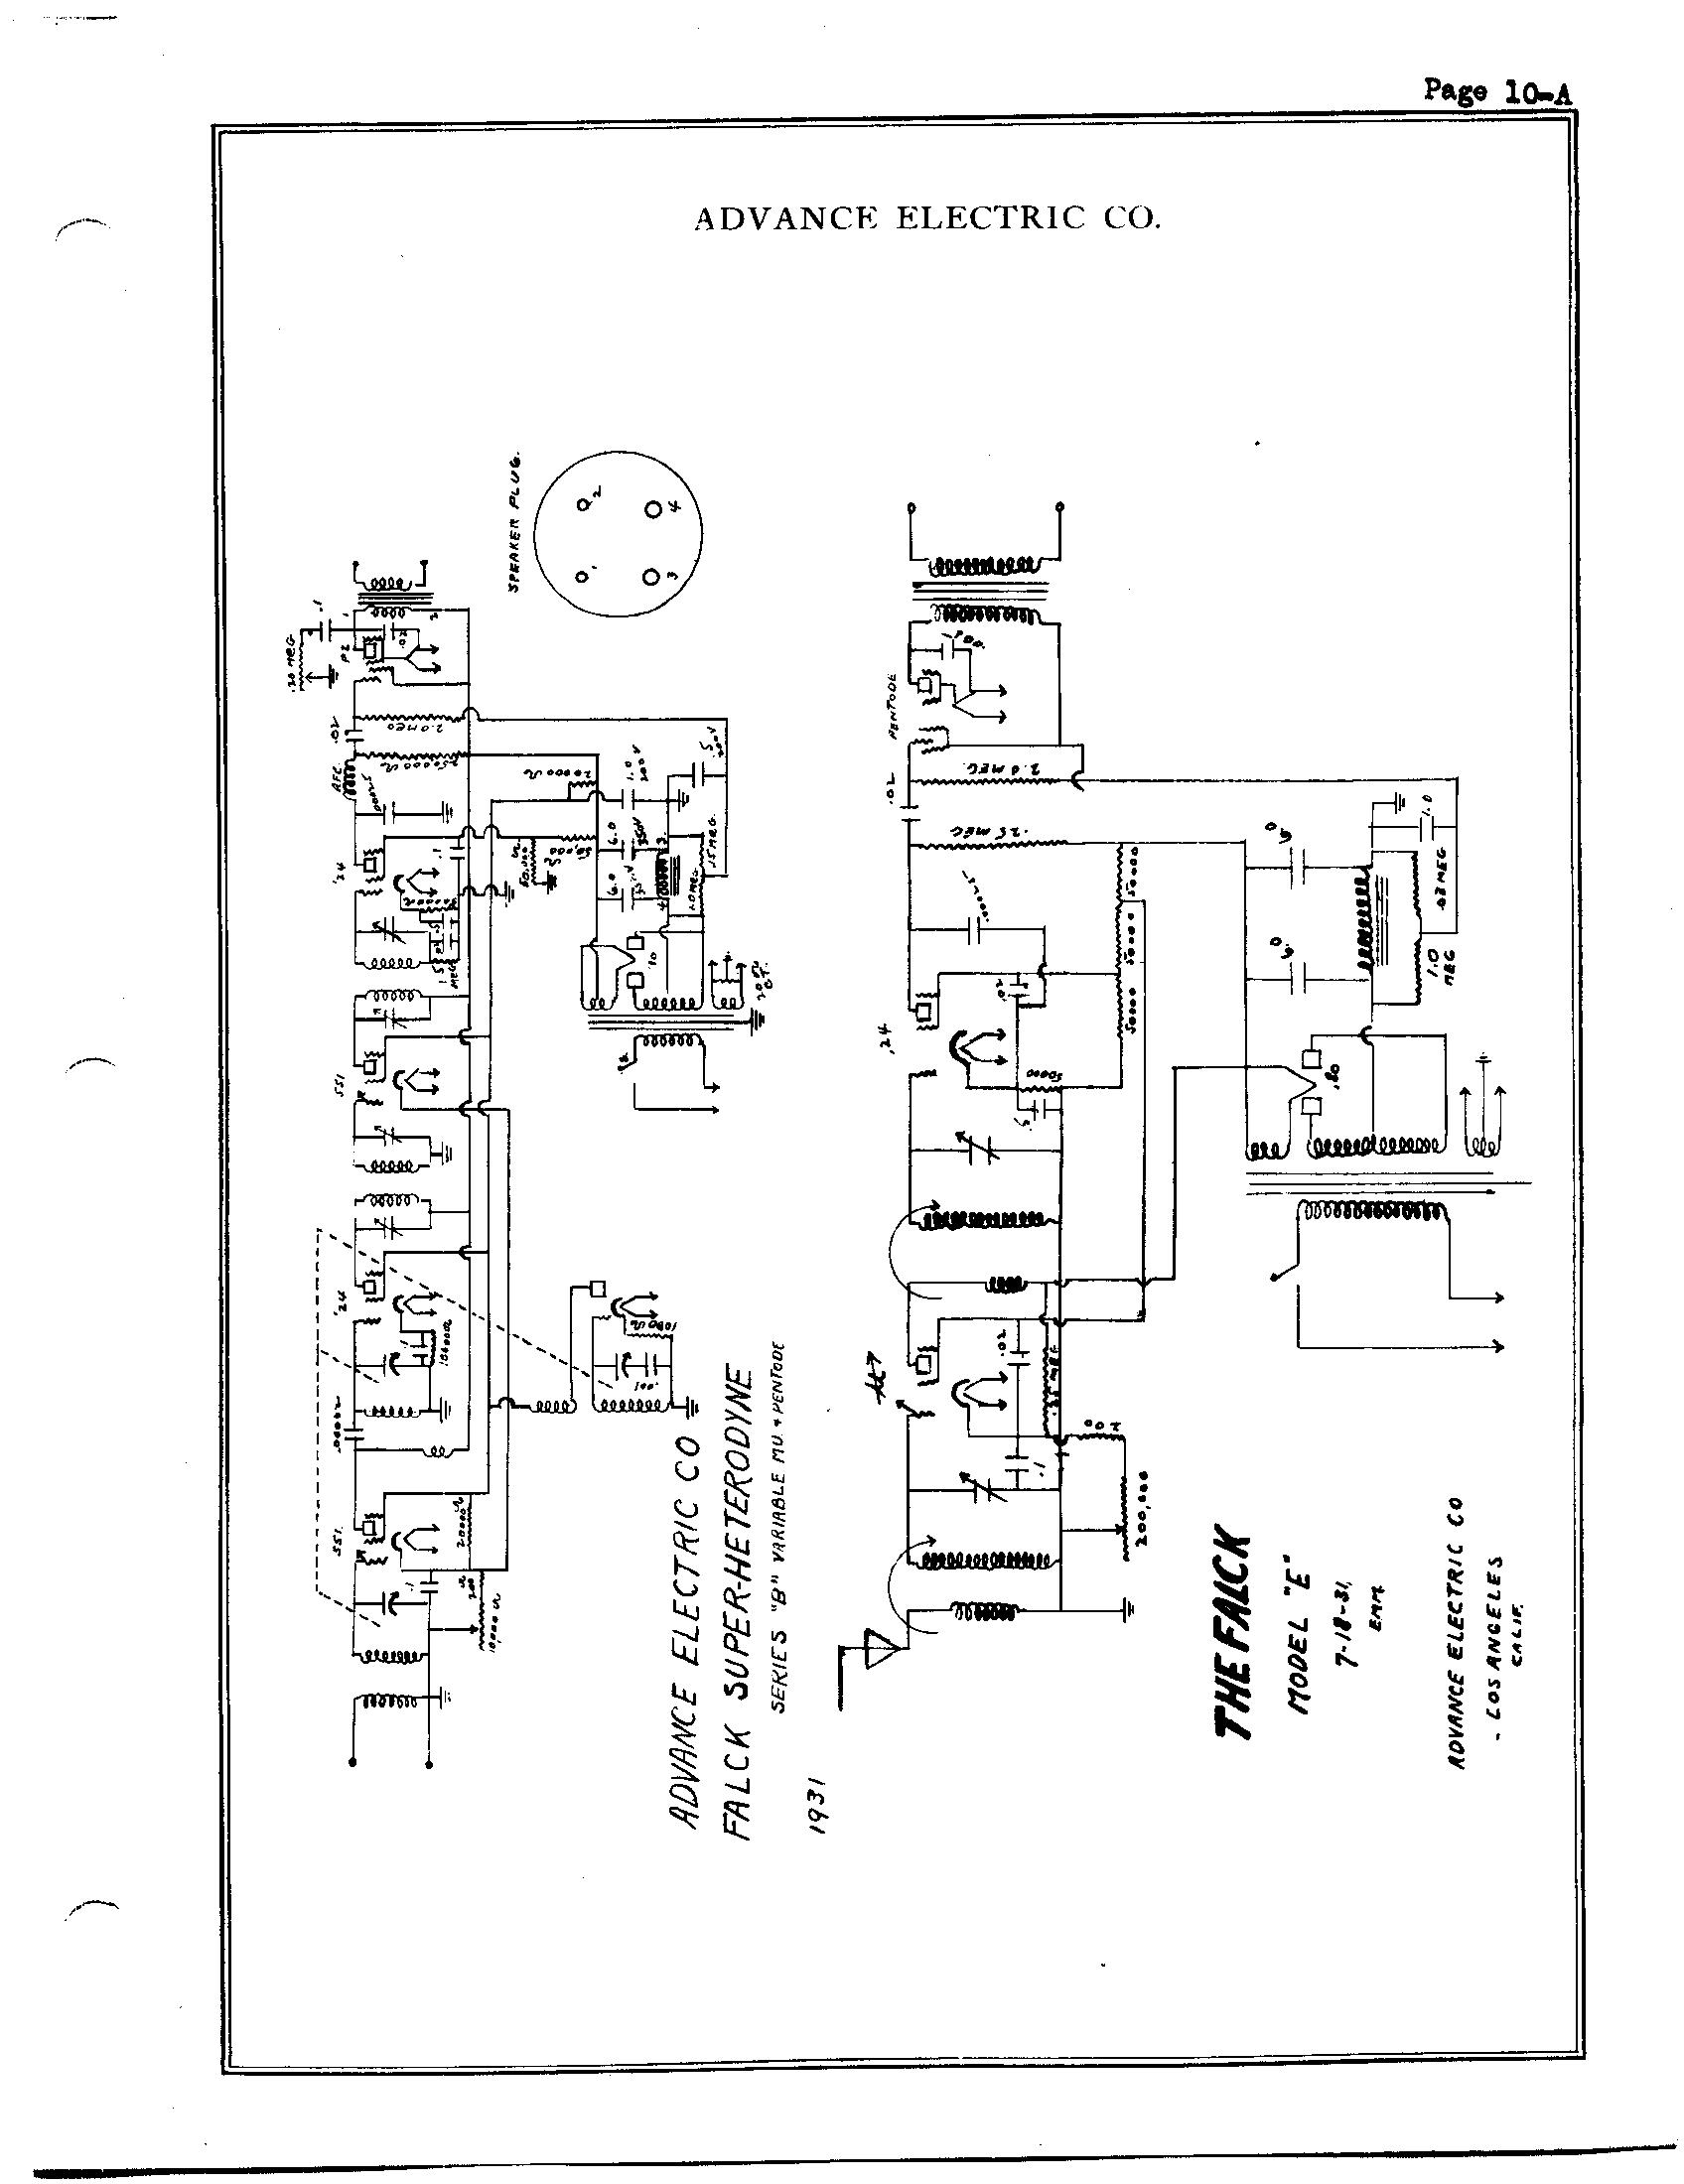 Page 1 (35.15 KB) Rider Manual Volume 2